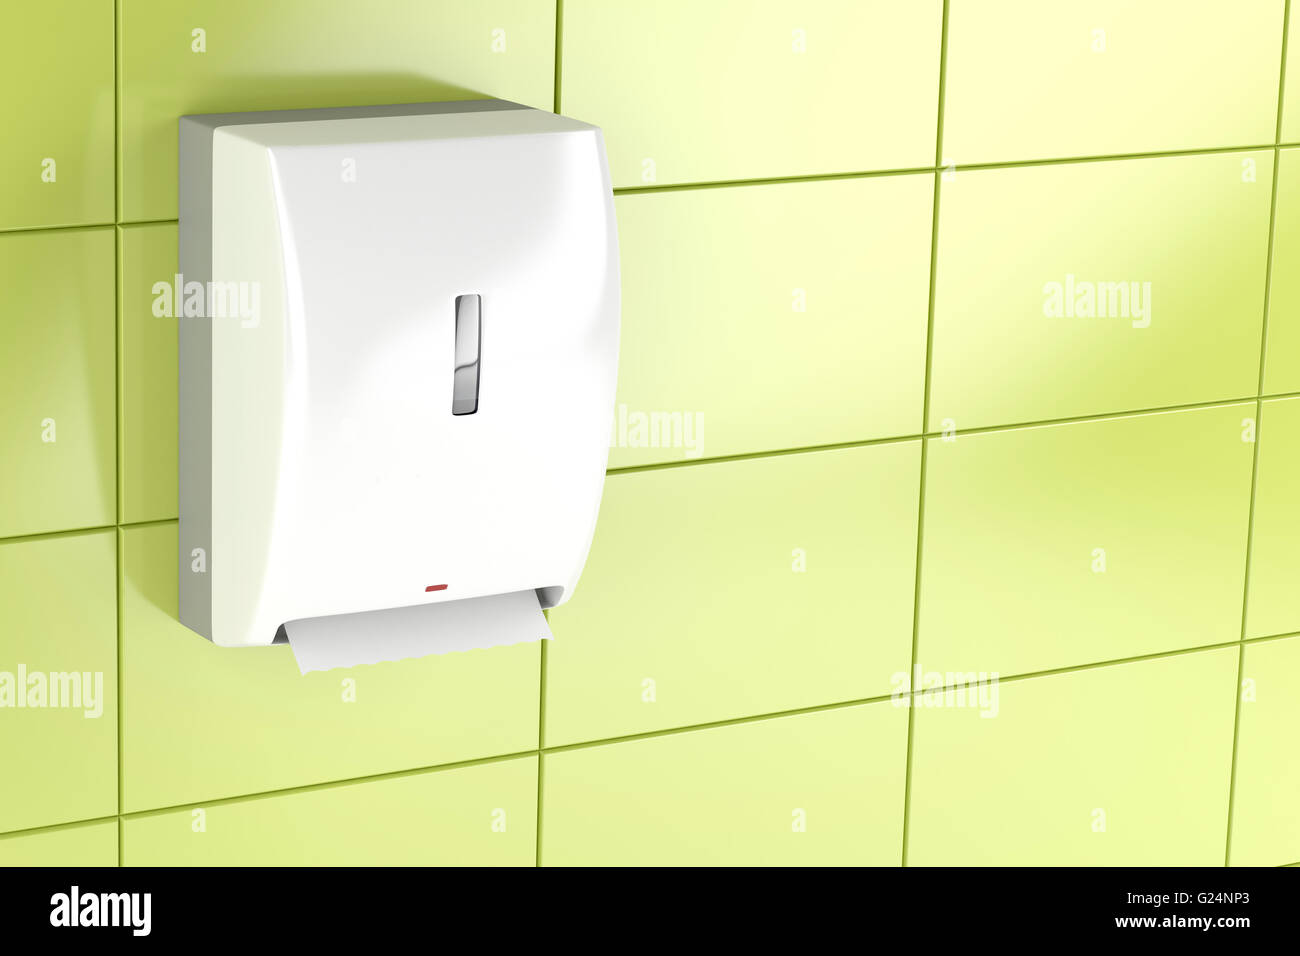 Paper Towel Dispenser Stock Photos & Paper Towel Dispenser Stock ...